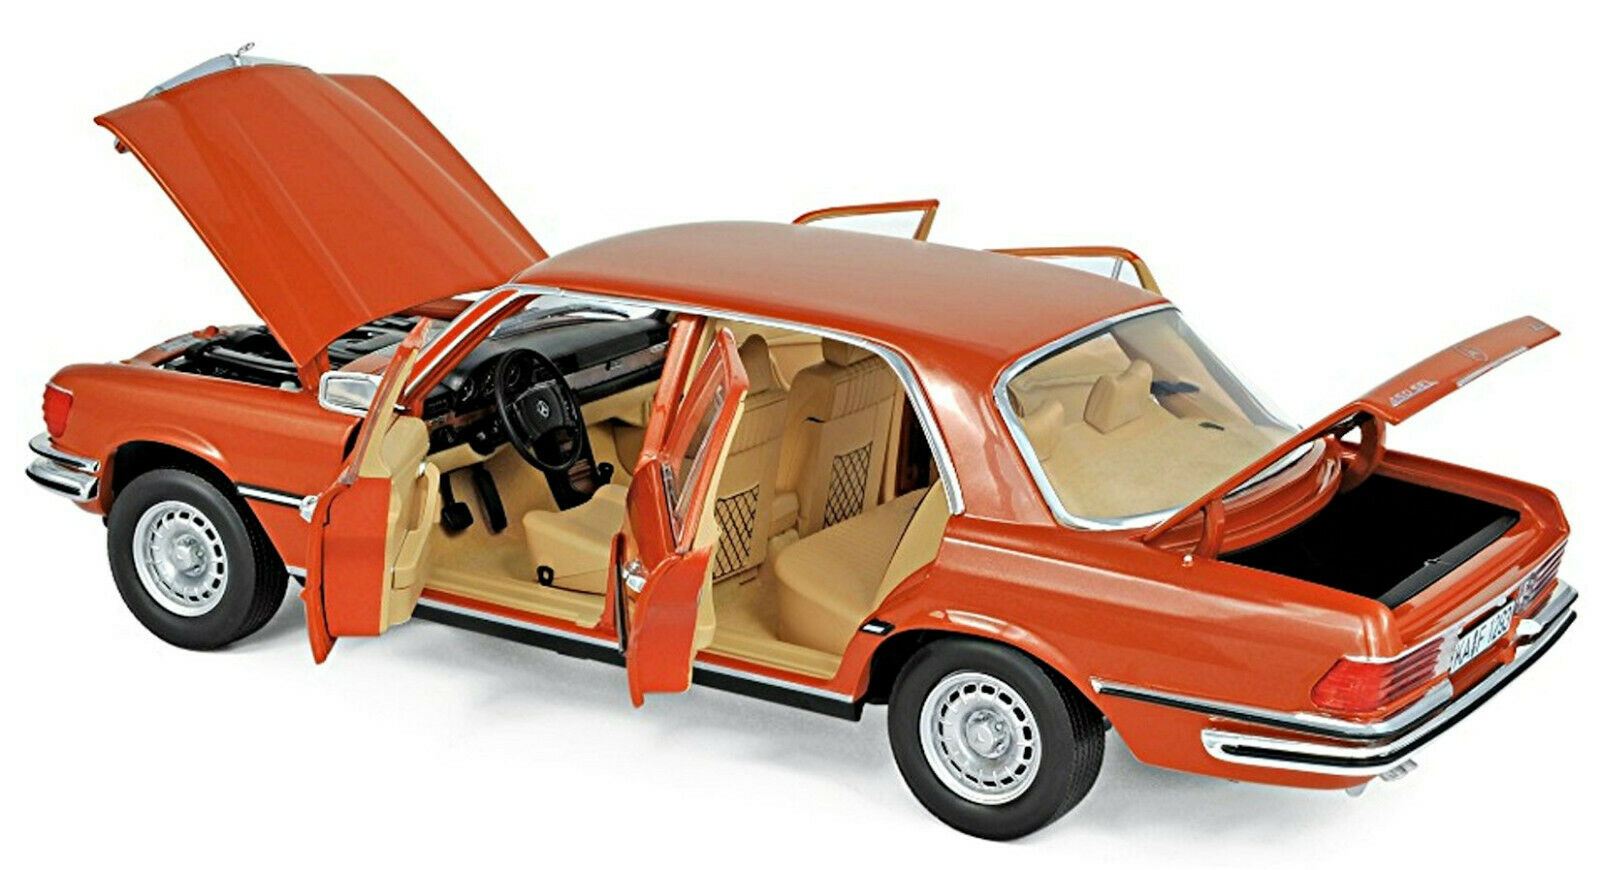 Mercedes-Benz Classe S 450 SEL 6.9 w116 - 1976 Inca Orange Metallic 1 18 Norev